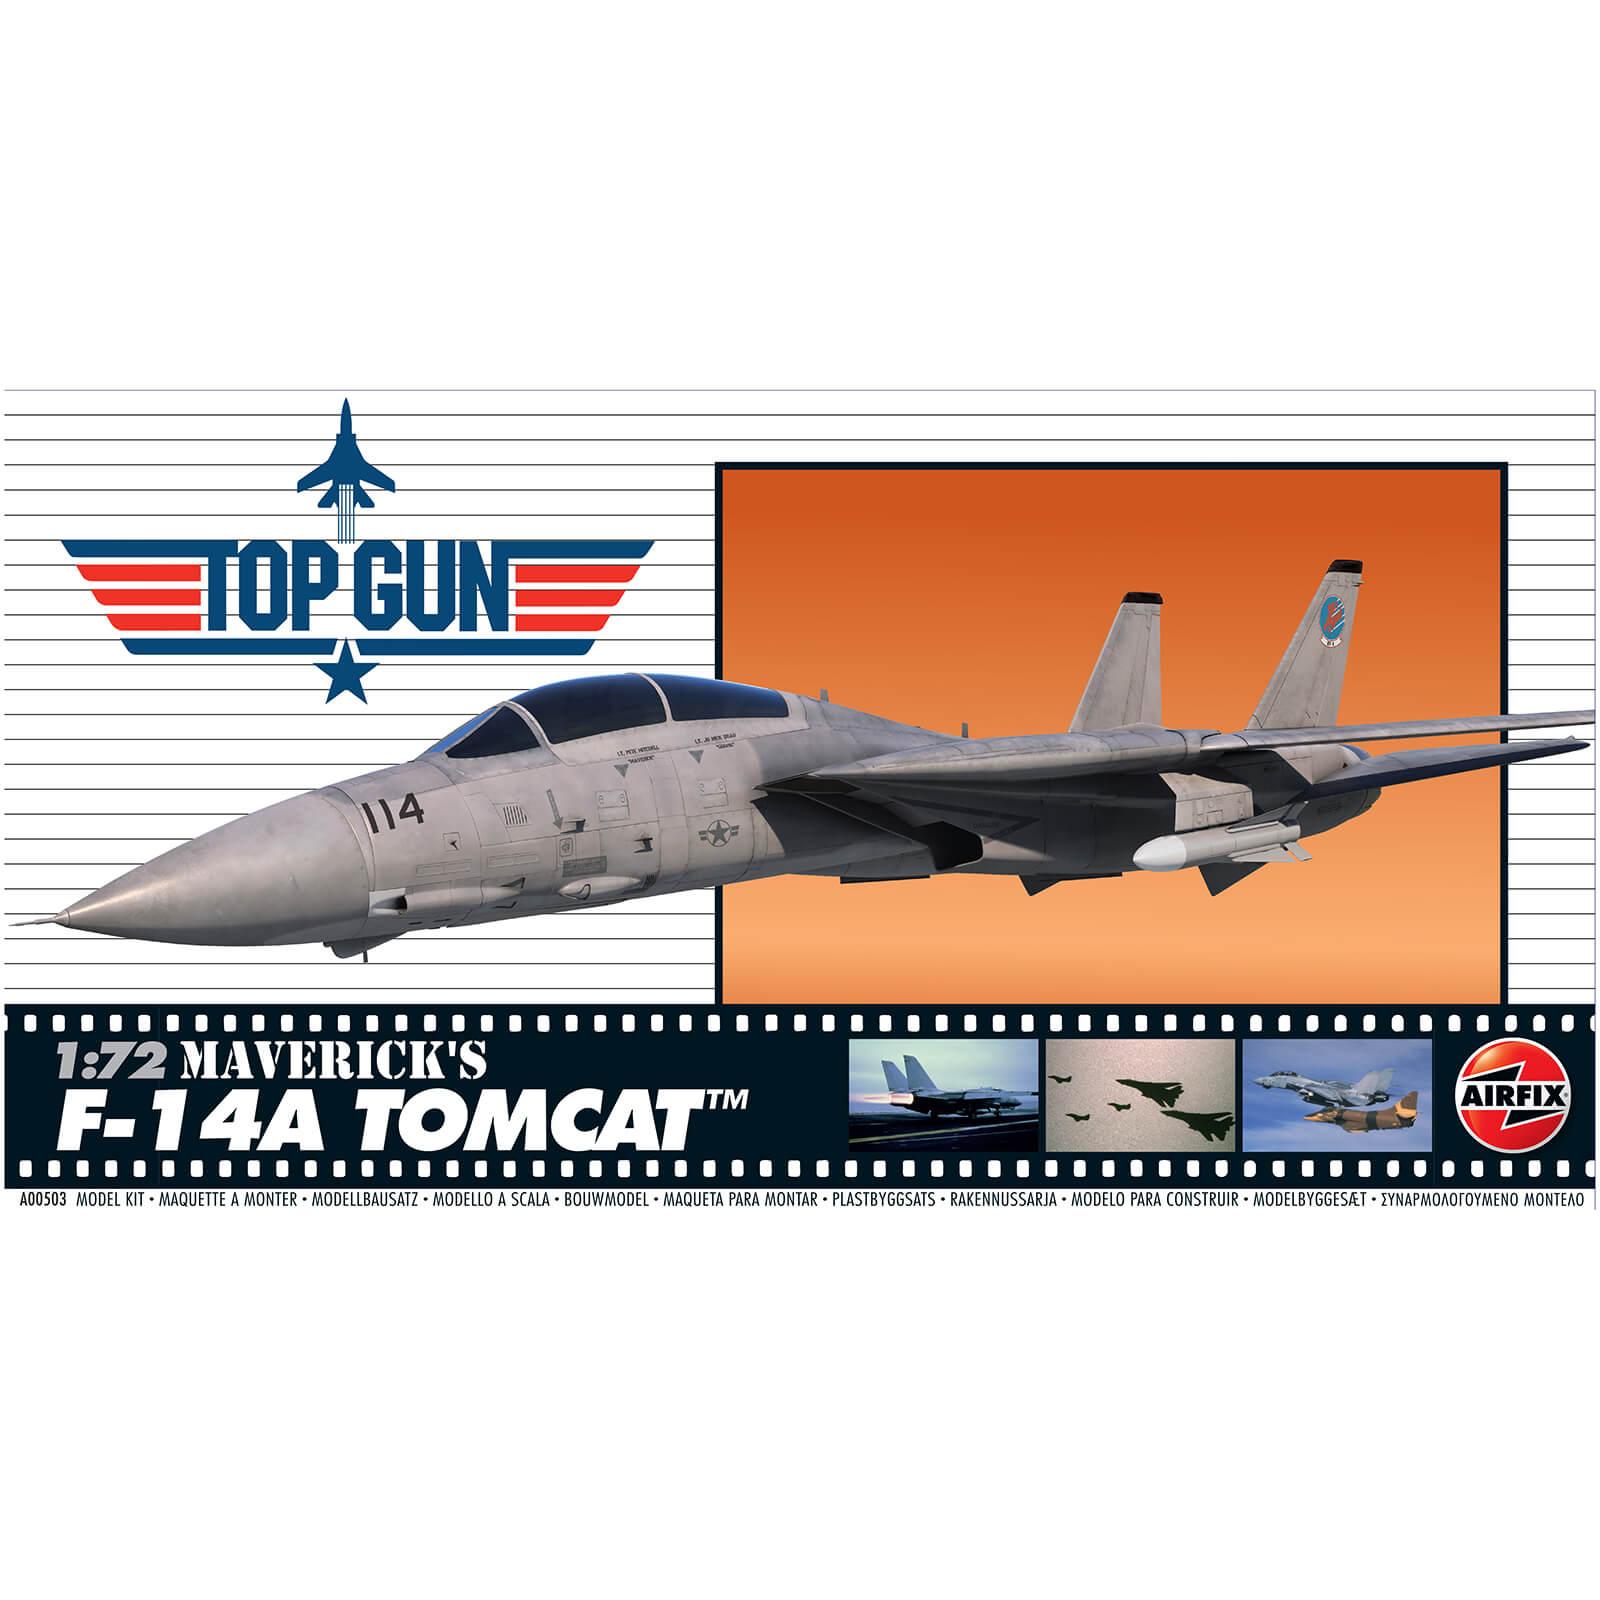 Top Gun Mavericks F-14A Tomcat Plastic Model Kit - Scale 1:72